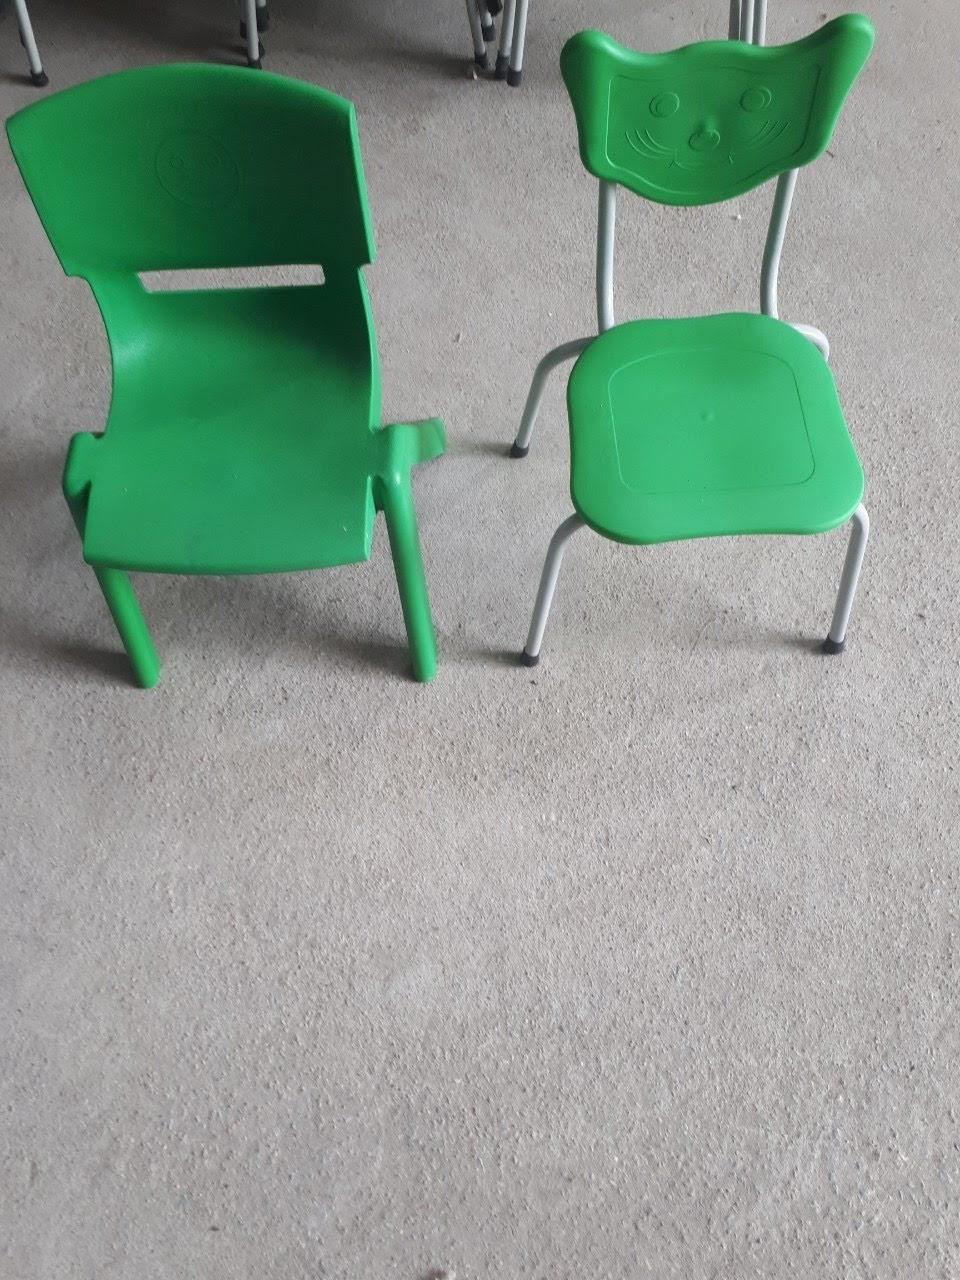 Bộ ghế mèo ghế đúc